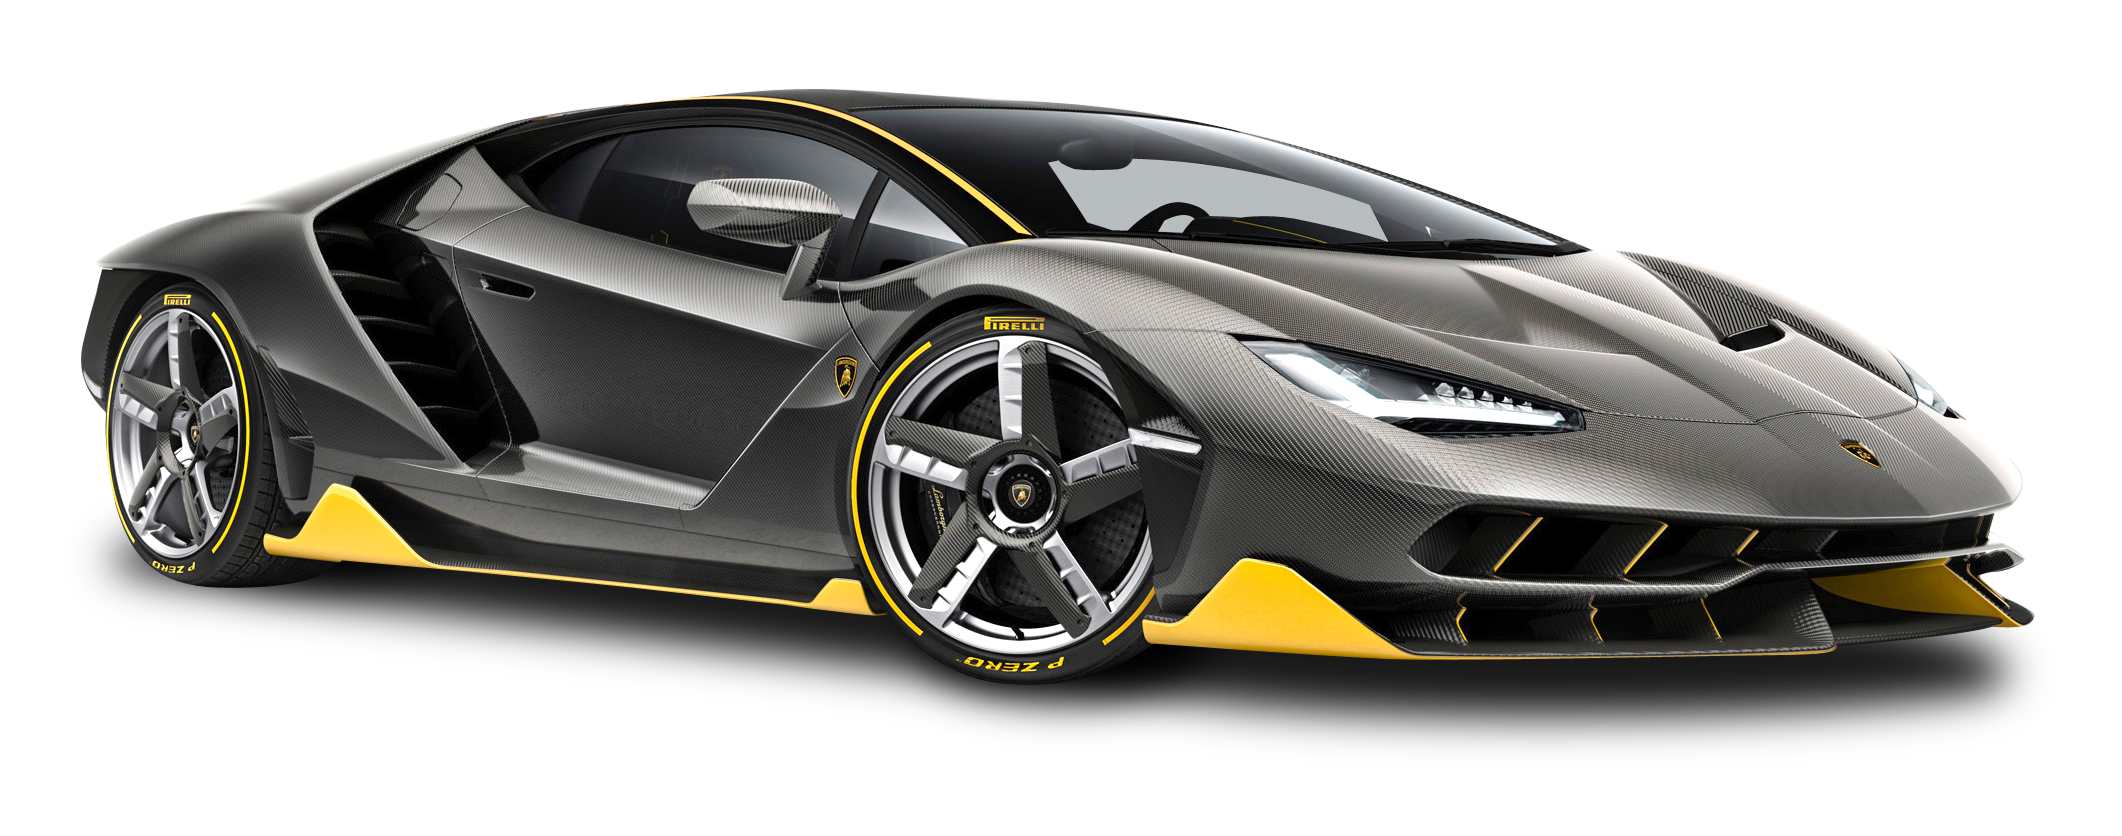 Lamborghini Centenario LP 770 4 Black Car PNG Image - Lamborghini PNG